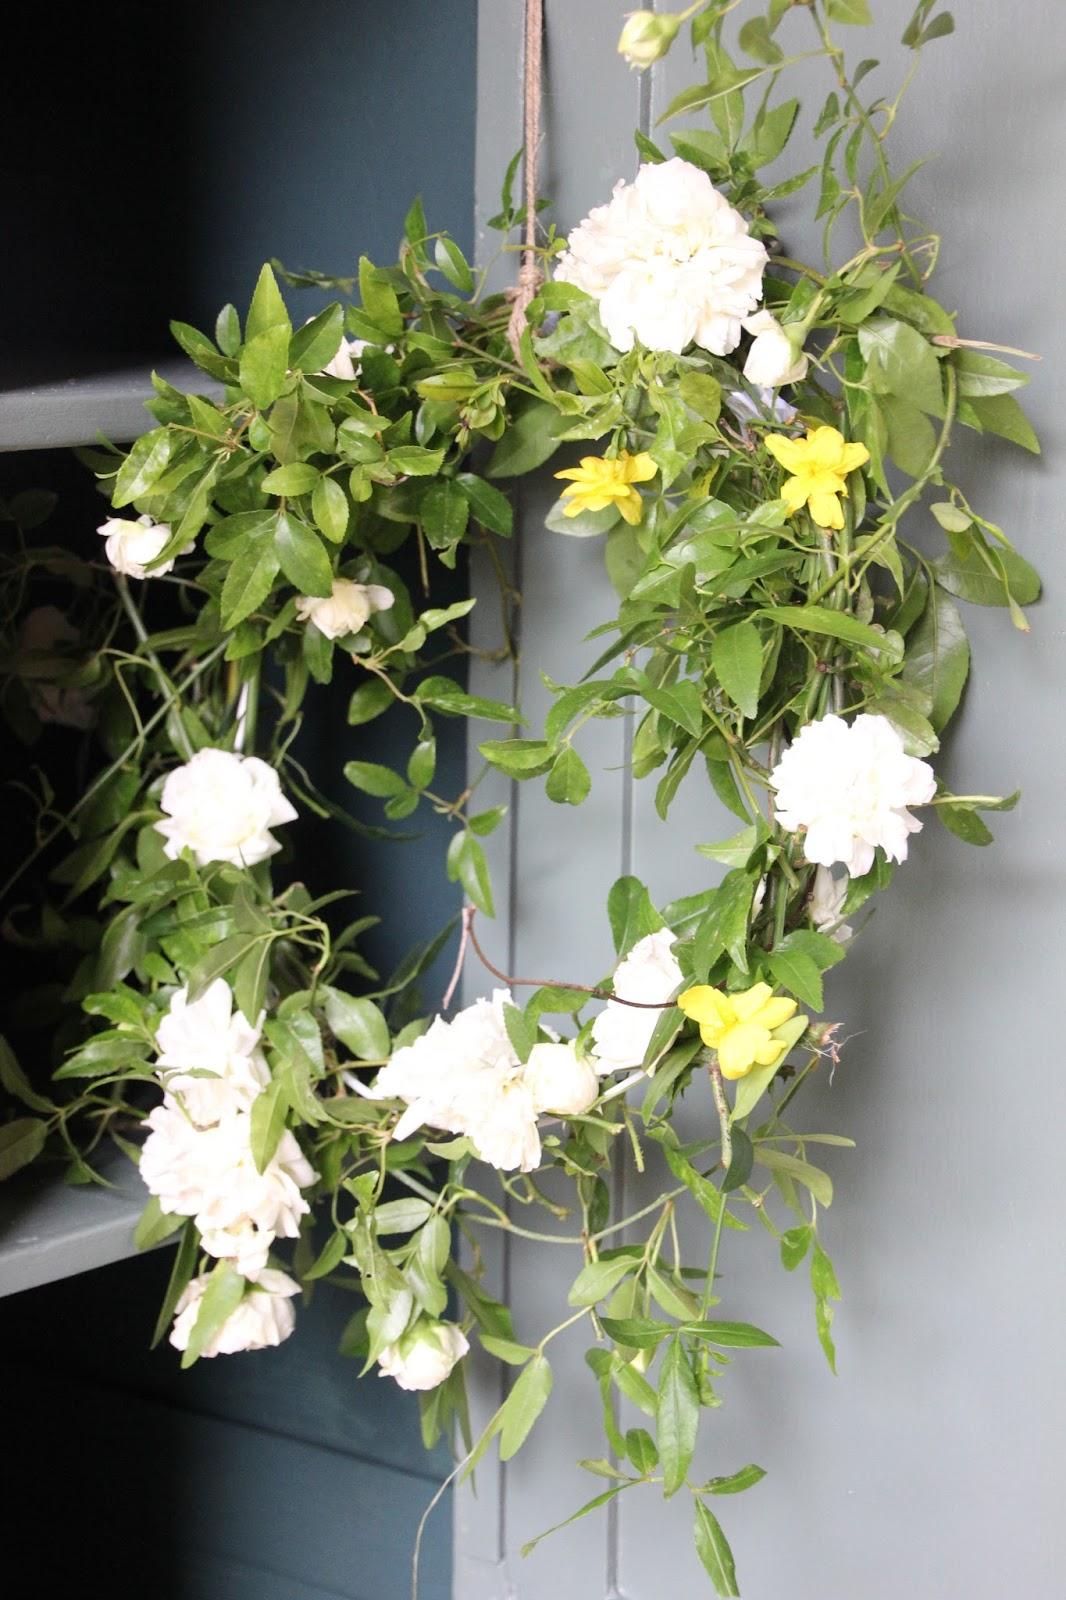 Regardsetmaisons ma couronne de fleurs homemade for Couronne de fleurs